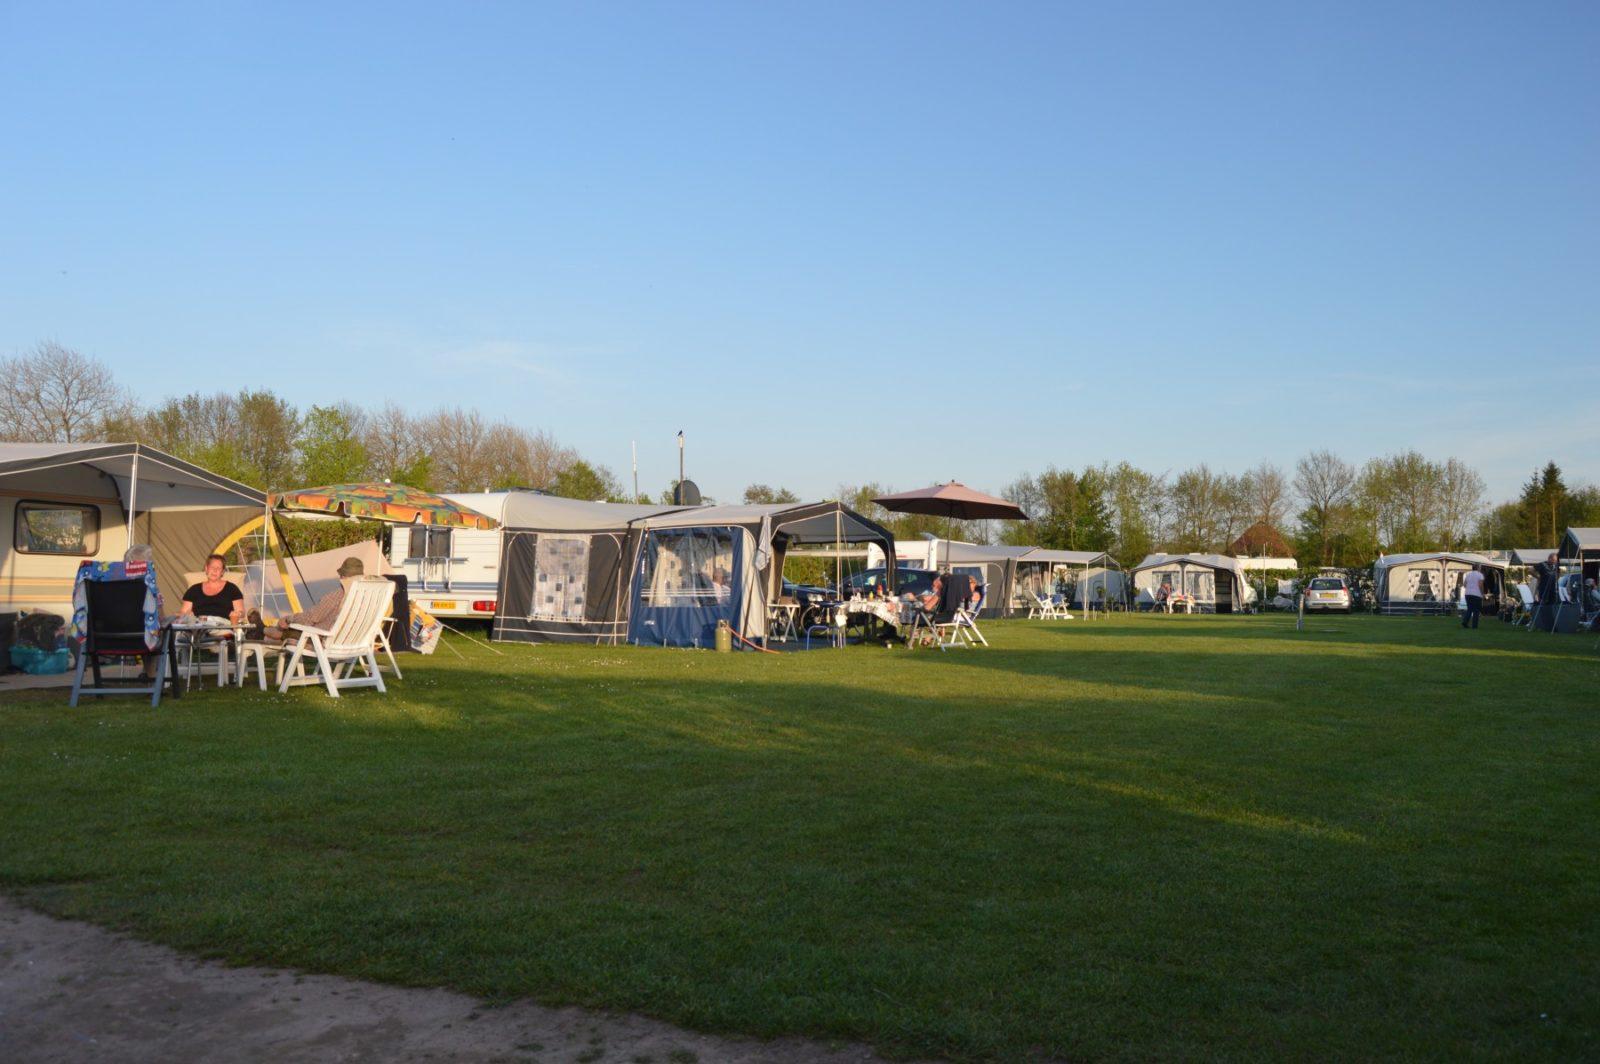 camping-rotandorp-drenthe-friesland 3